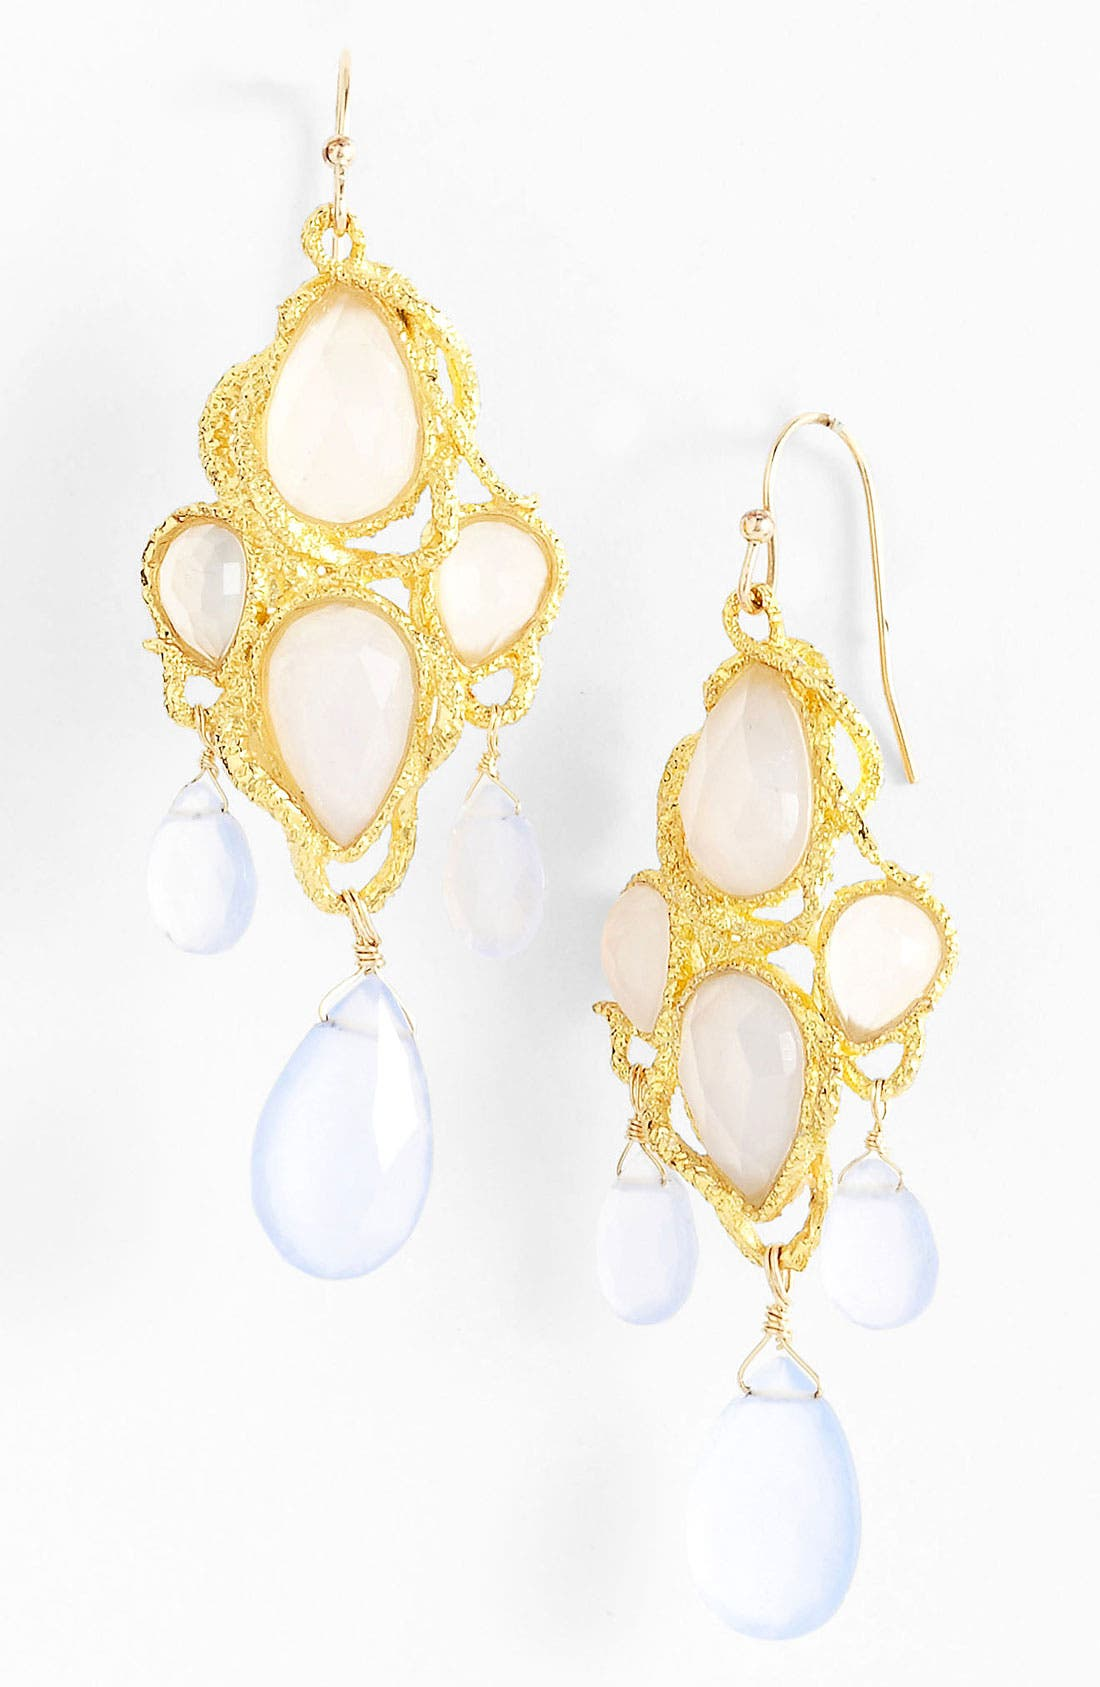 Main Image - Alexis Bittar 'Elements - Siyabona' Chandelier Earrings